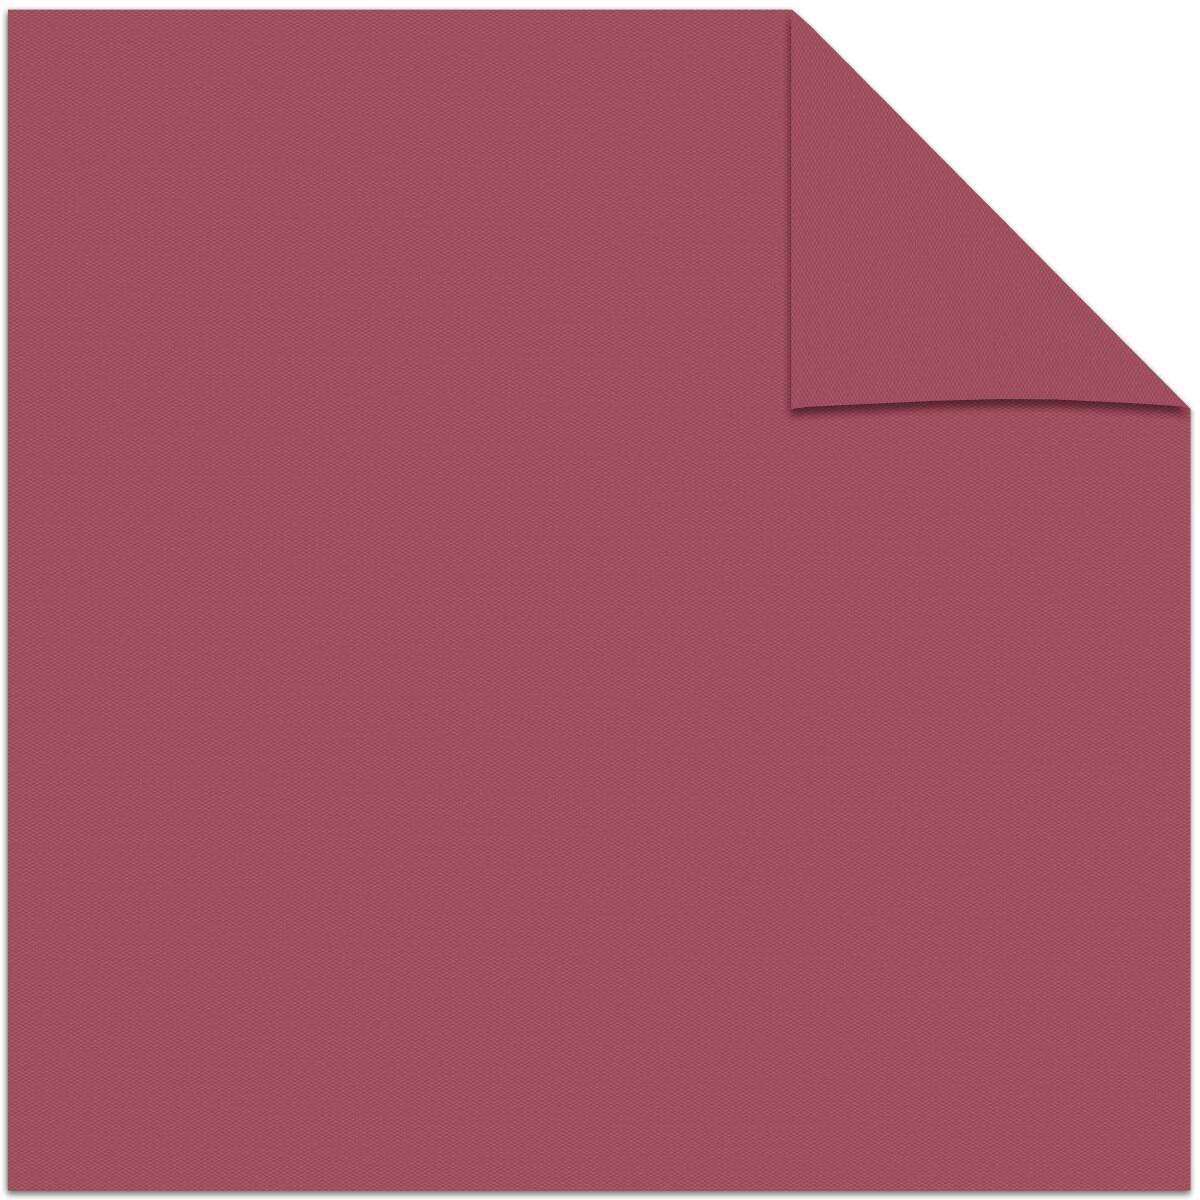 Tenda a rullo oscurante INSPIRE Tokyo rosso 140 x 160 cm - 5